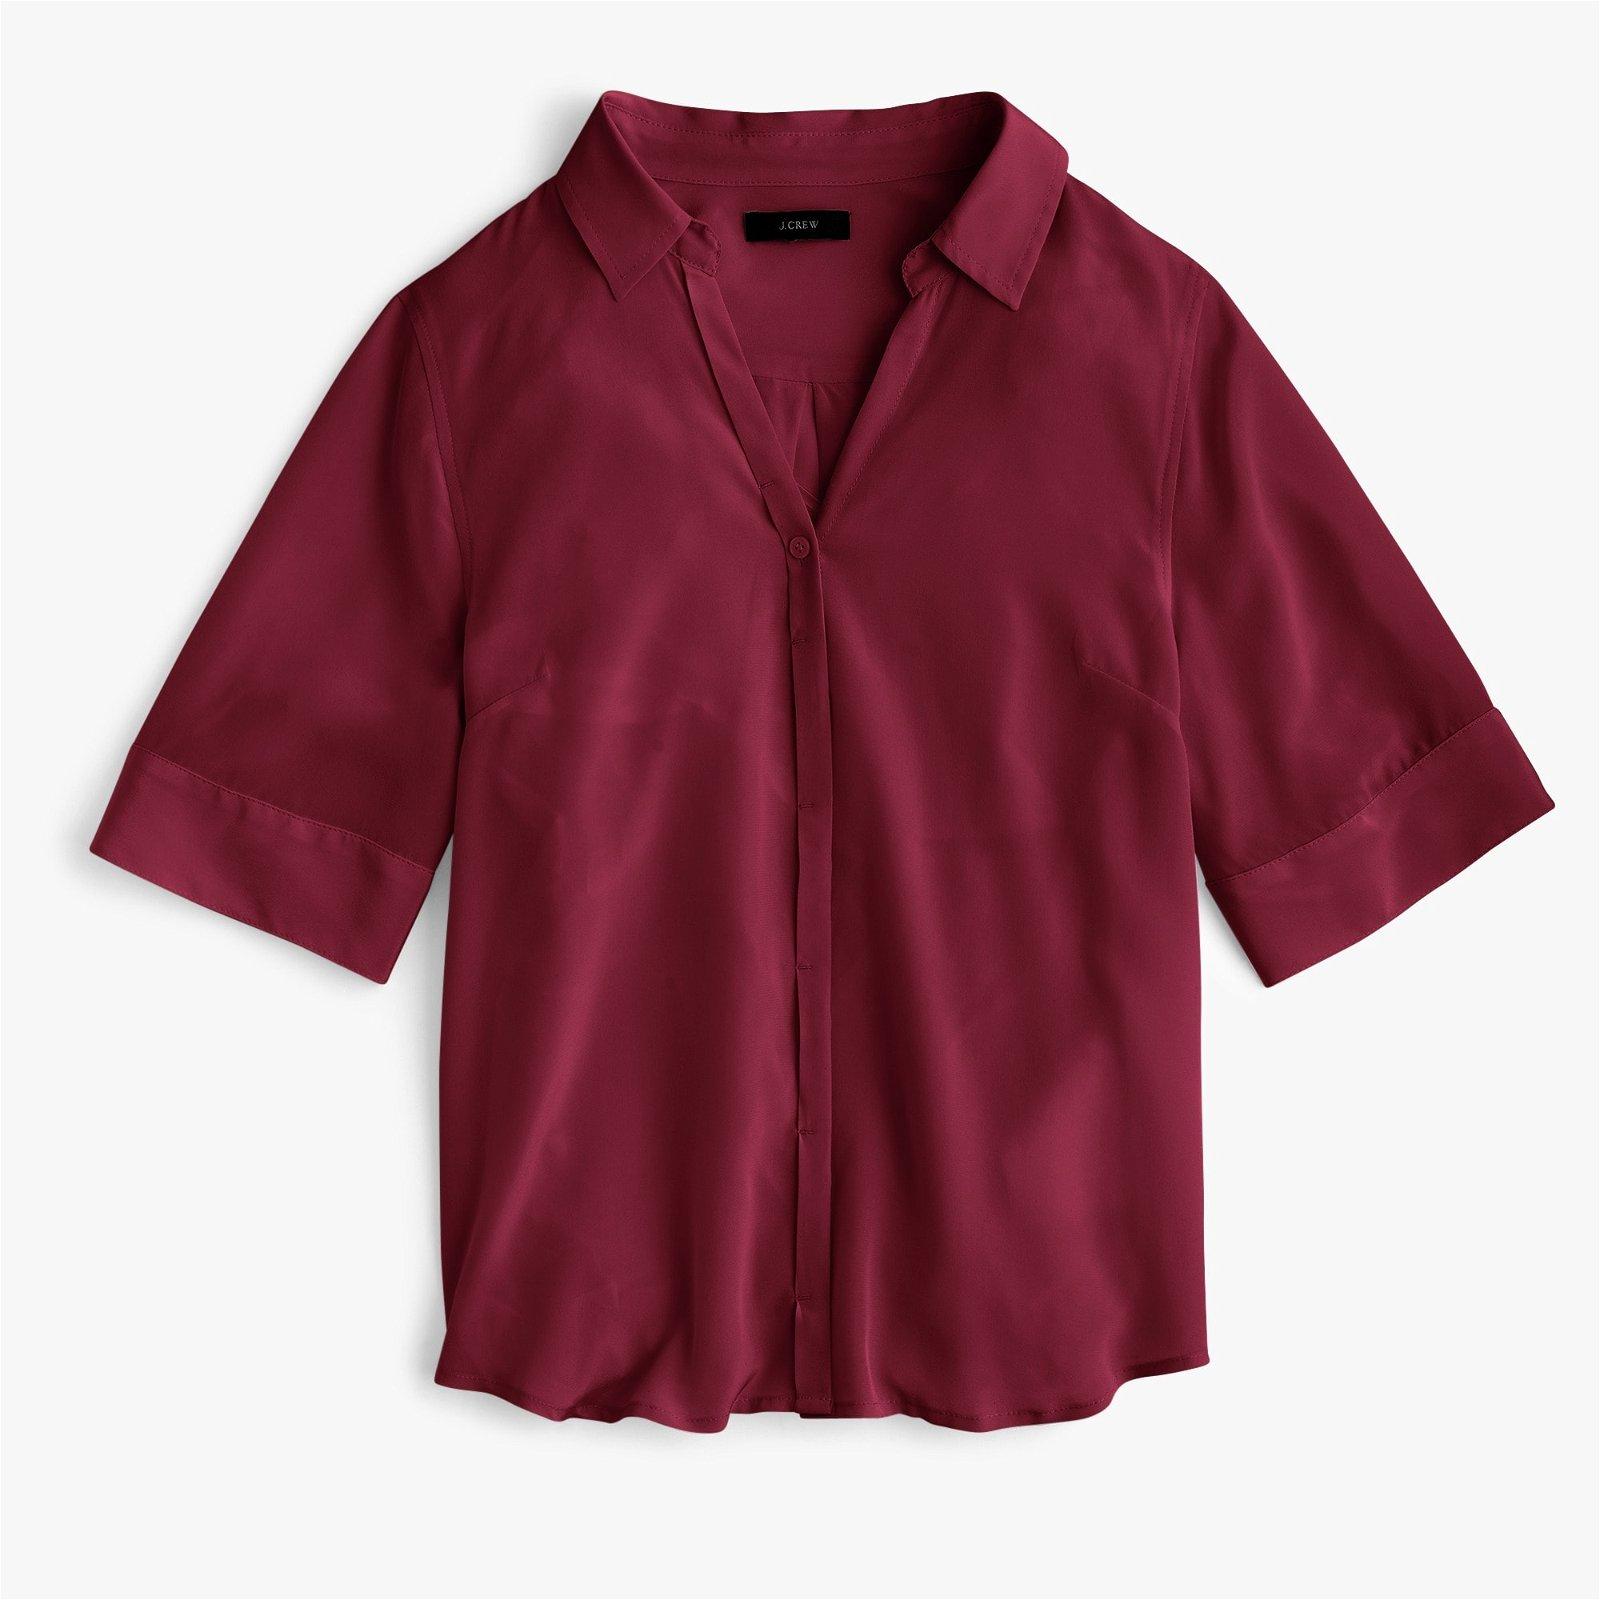 Classic Short-sleeve button-up shirt in silk